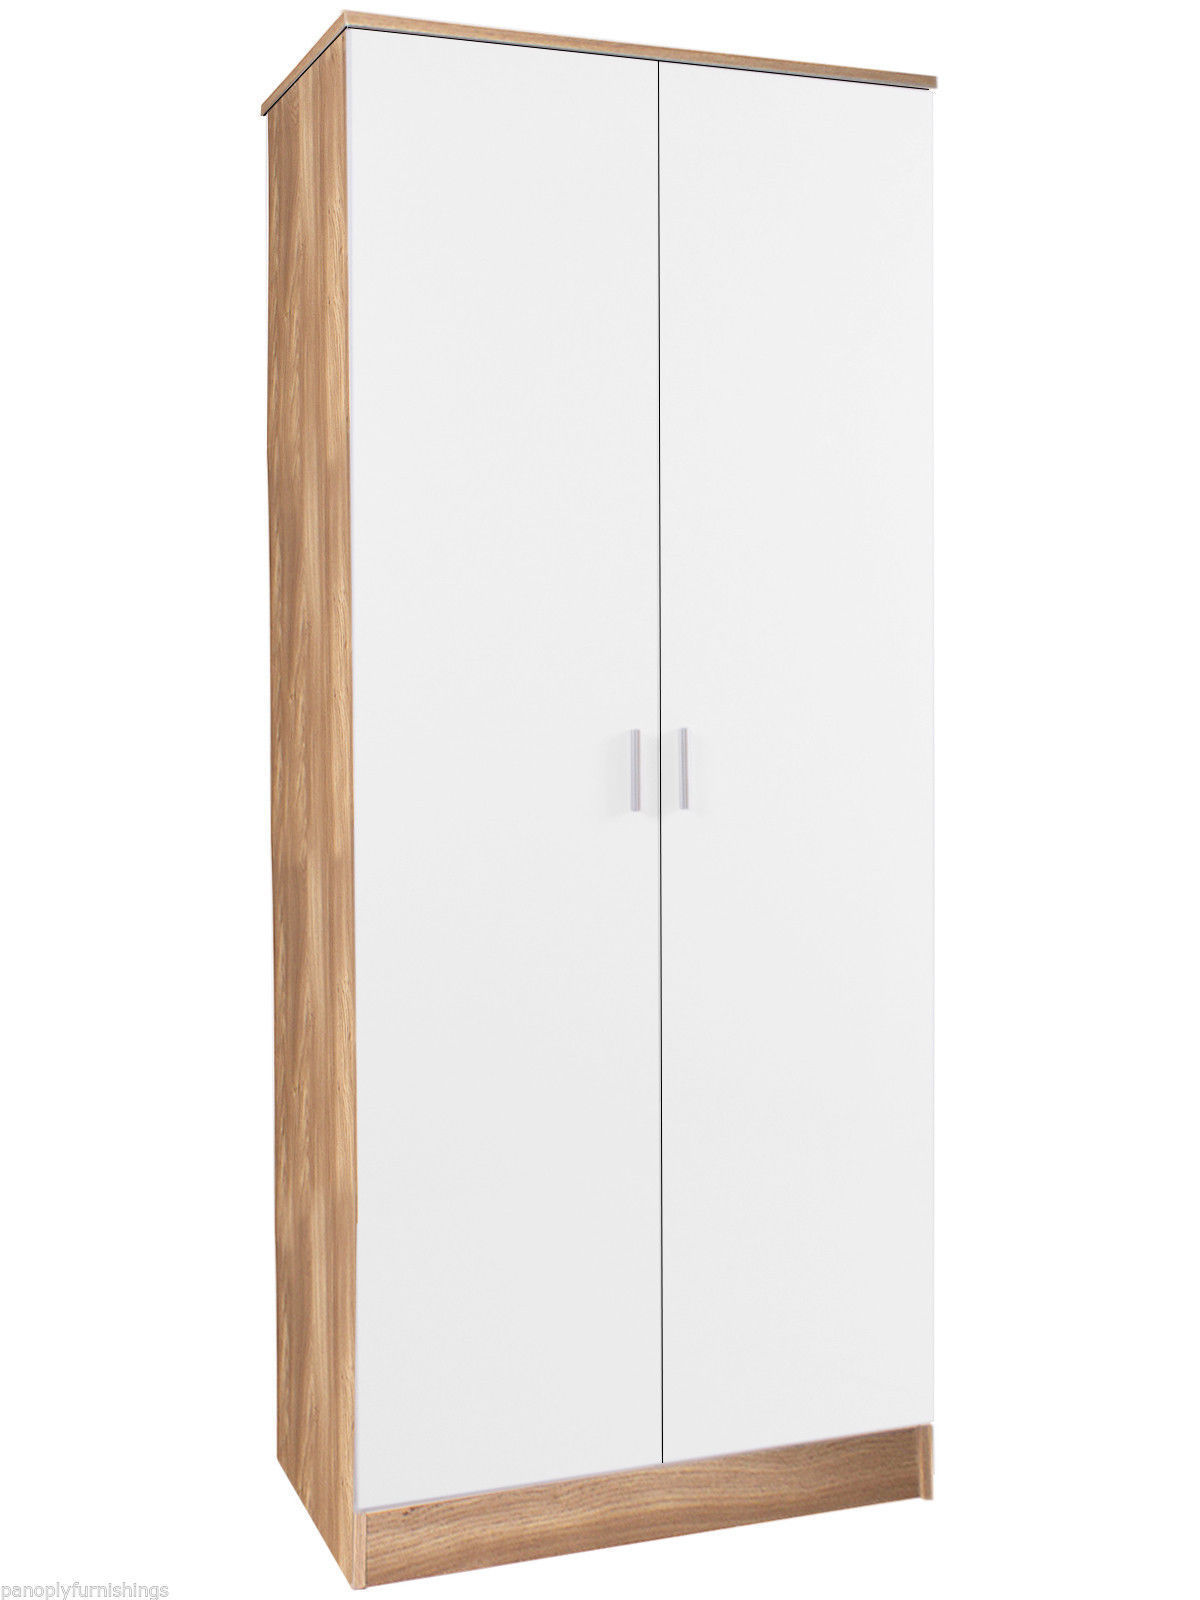 Ottawa 2 Door Wardrobe High Gloss White & Oak Frame Storage Bedroom ...